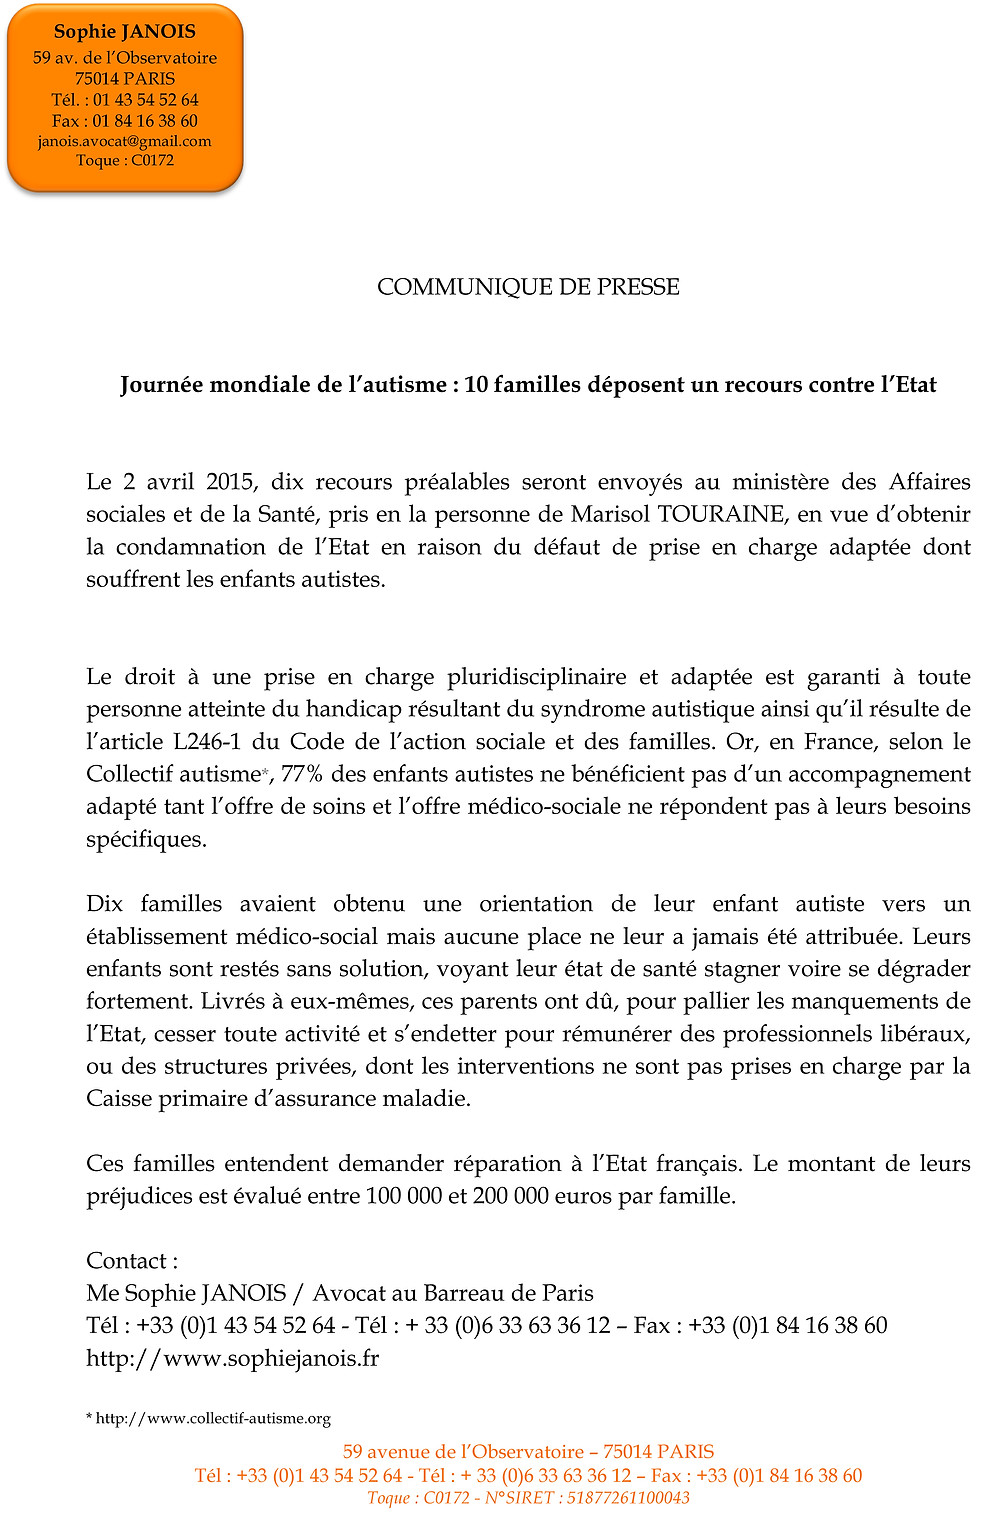 COMMUNIQUE DE PRESSE.jpg